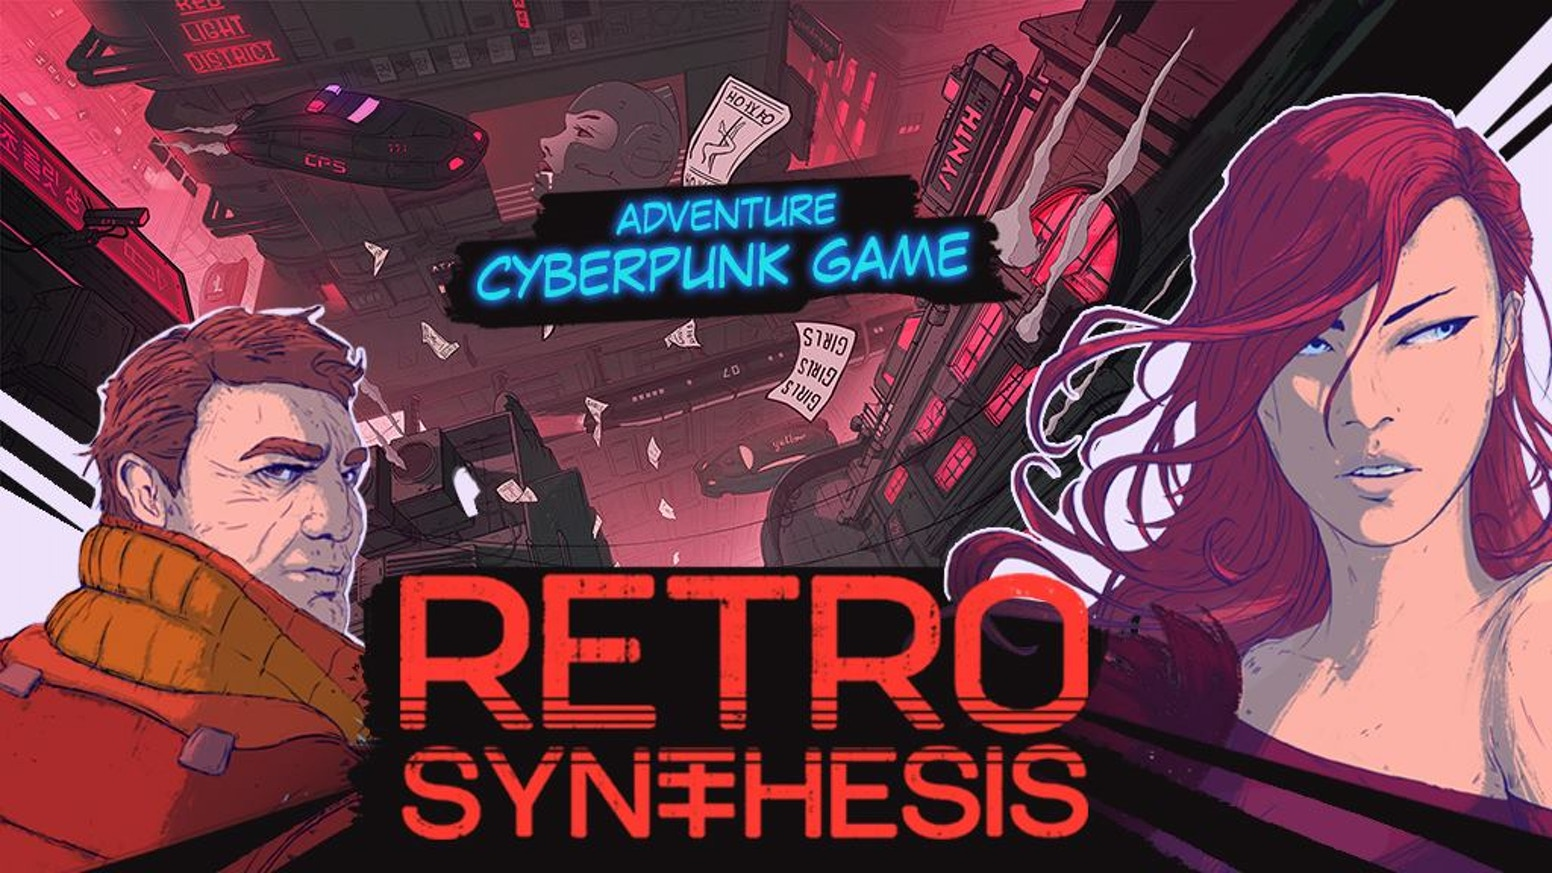 Retro Synthesis - adventure, cyberpunk game by PlayWay —Kickstarter